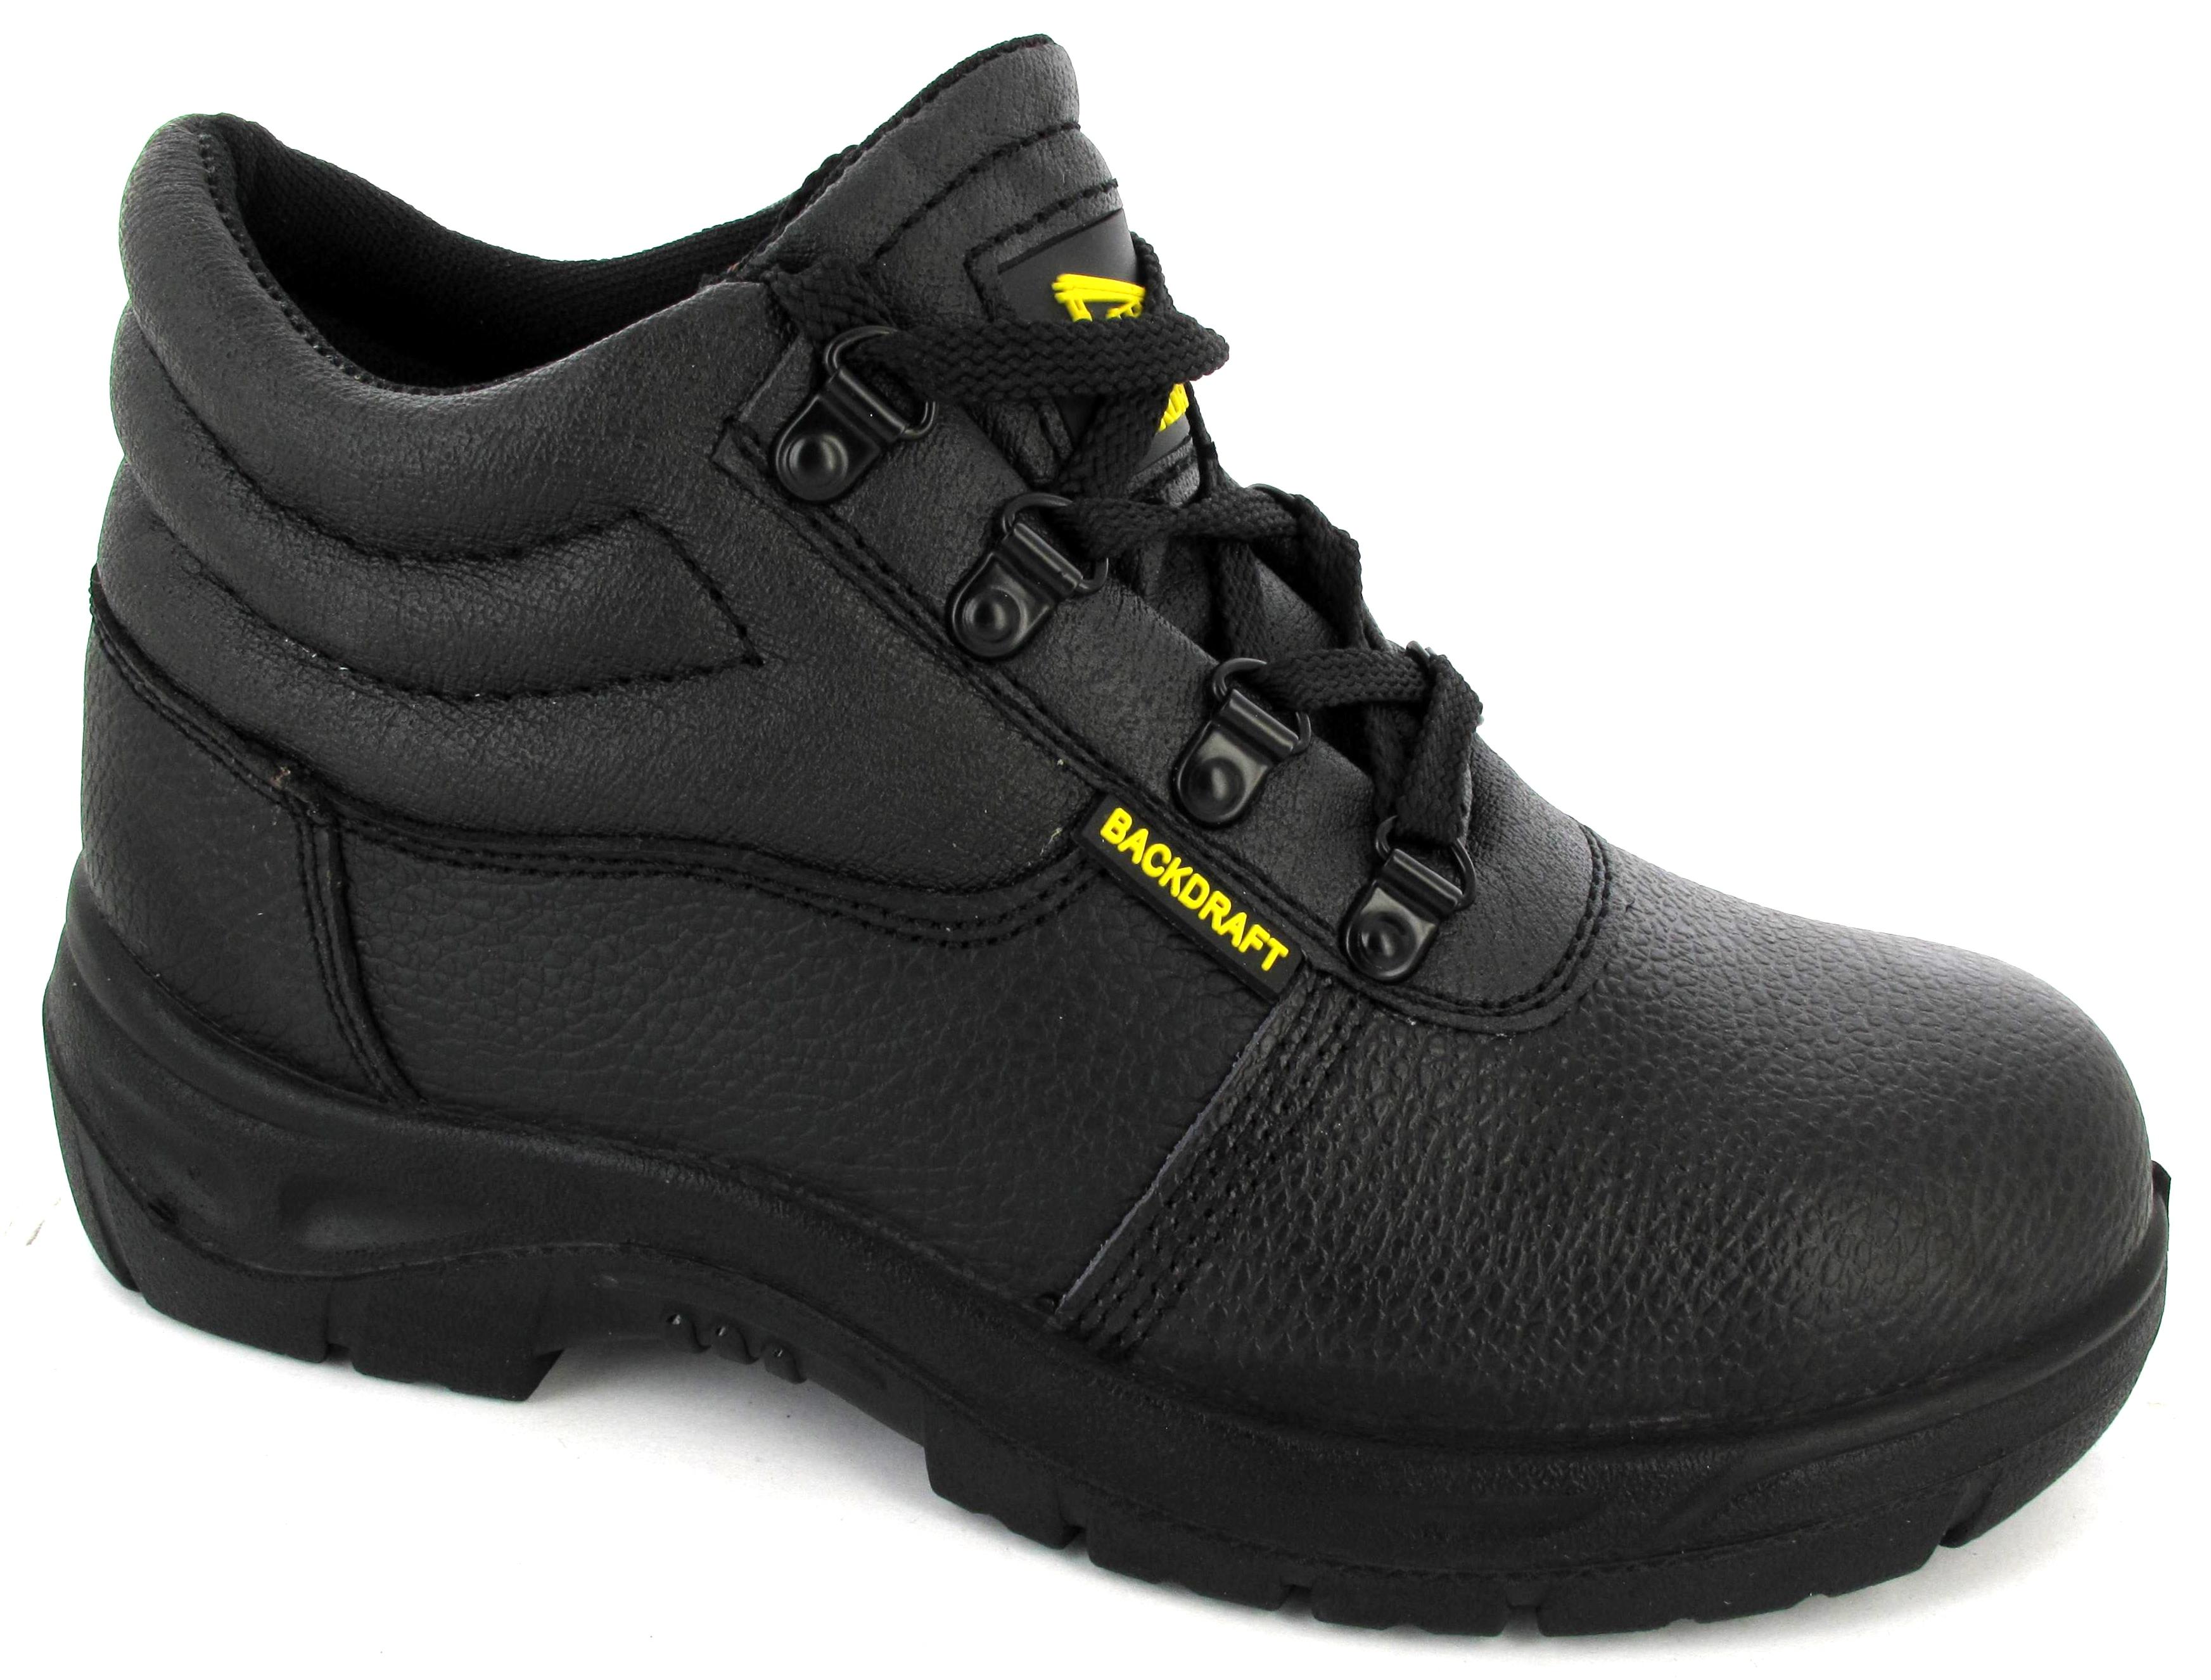 mens black steeltoe leather work trainers safety footwear. Black Bedroom Furniture Sets. Home Design Ideas